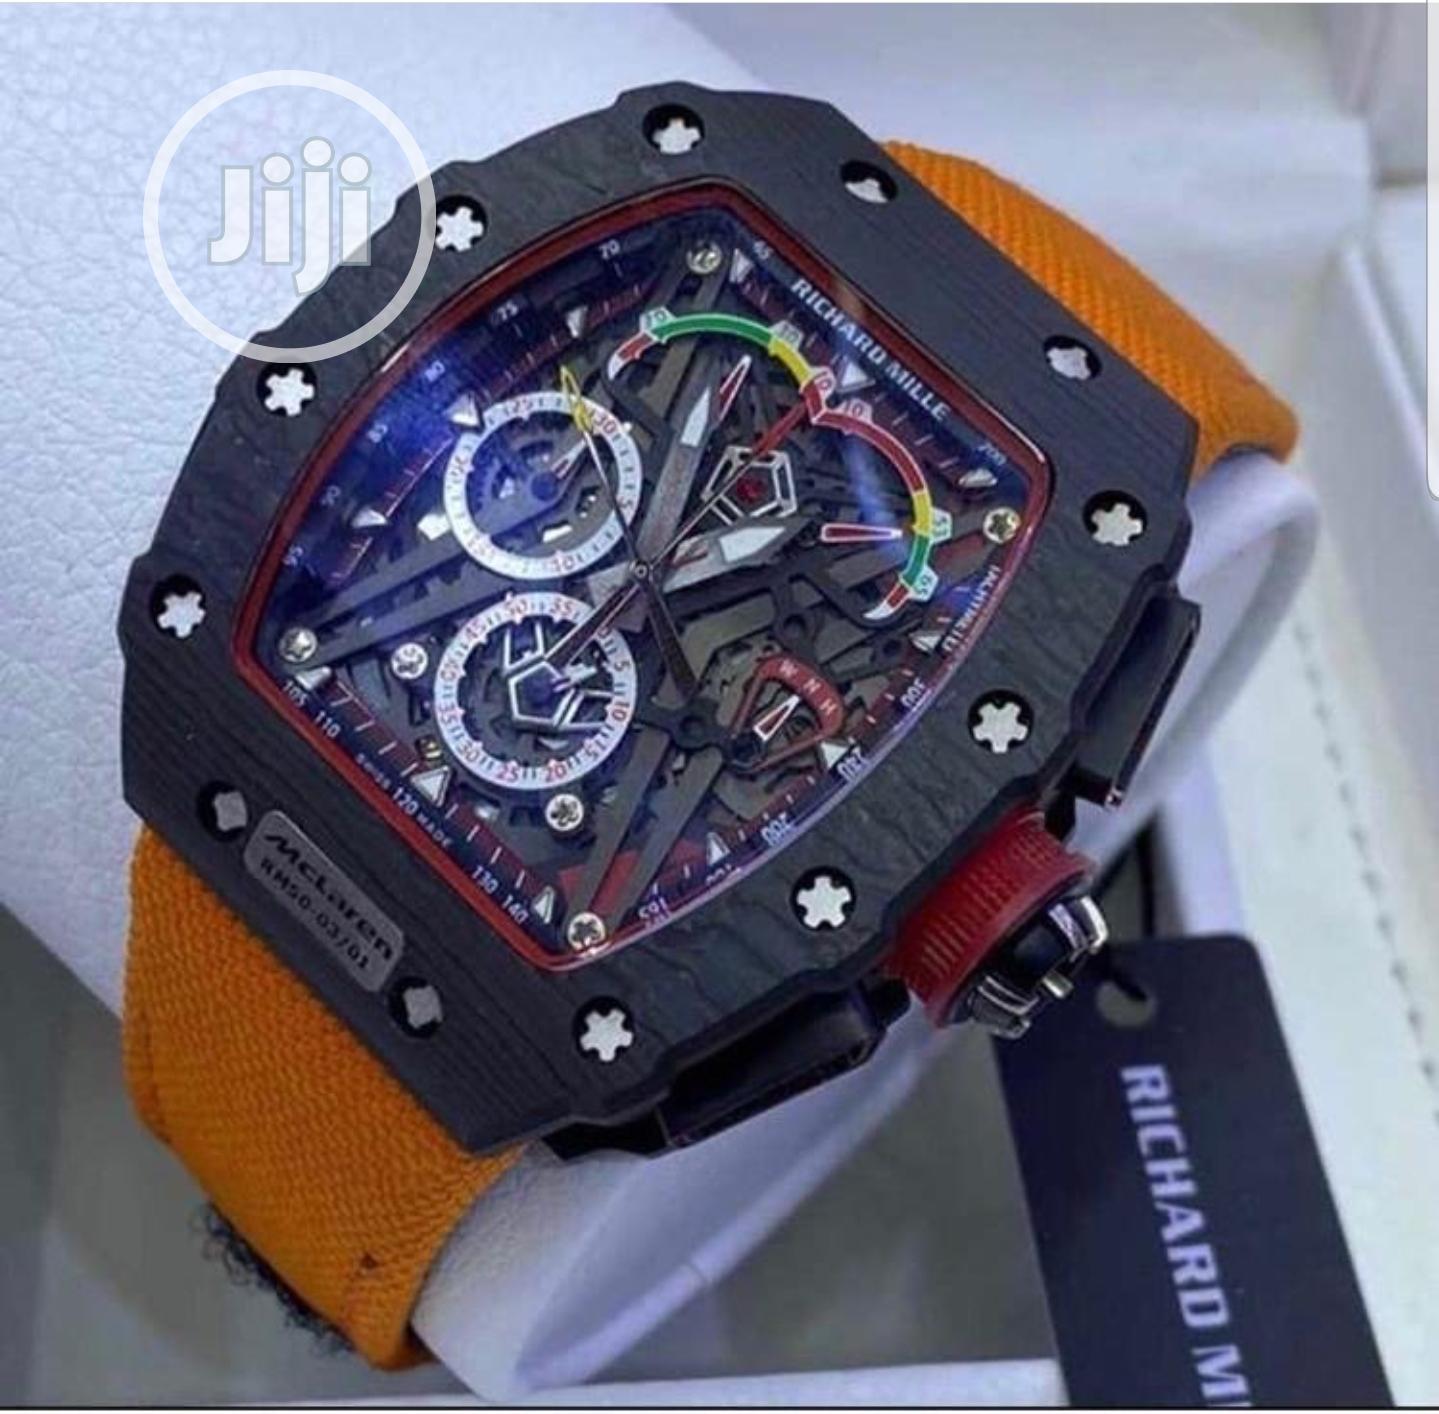 Richard Mille McLaren RM50-03/01